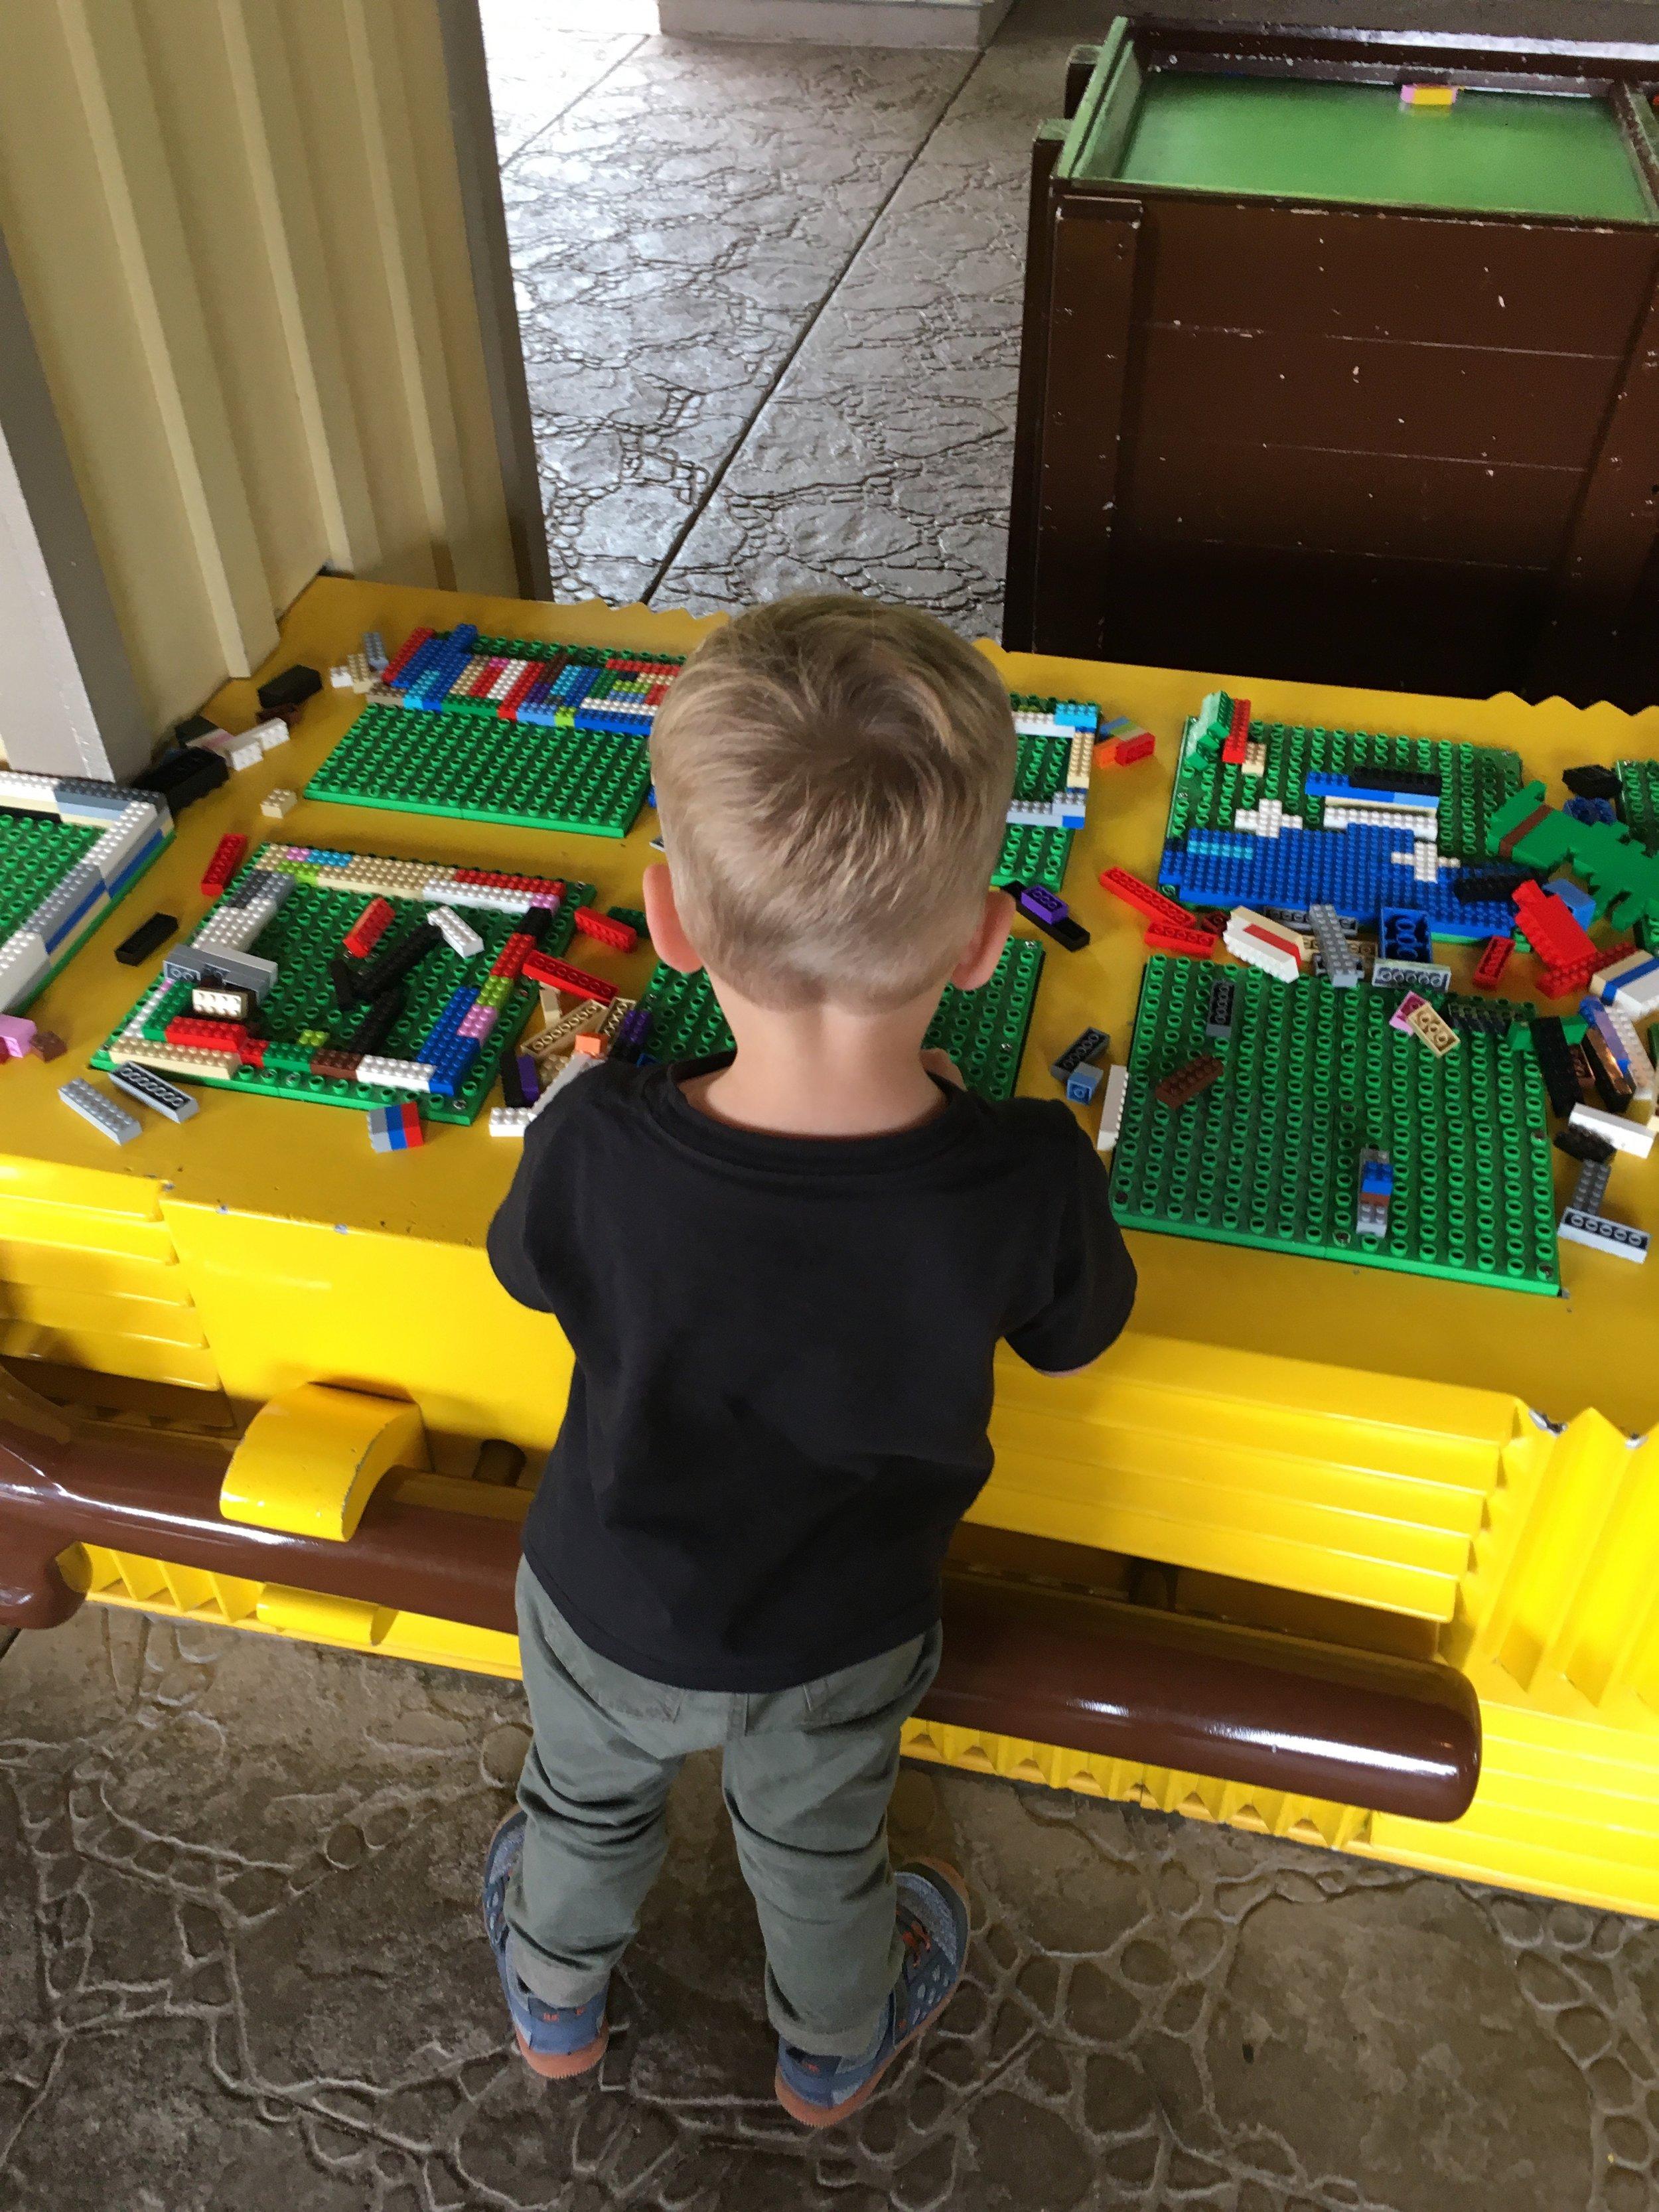 Lego Playing Station